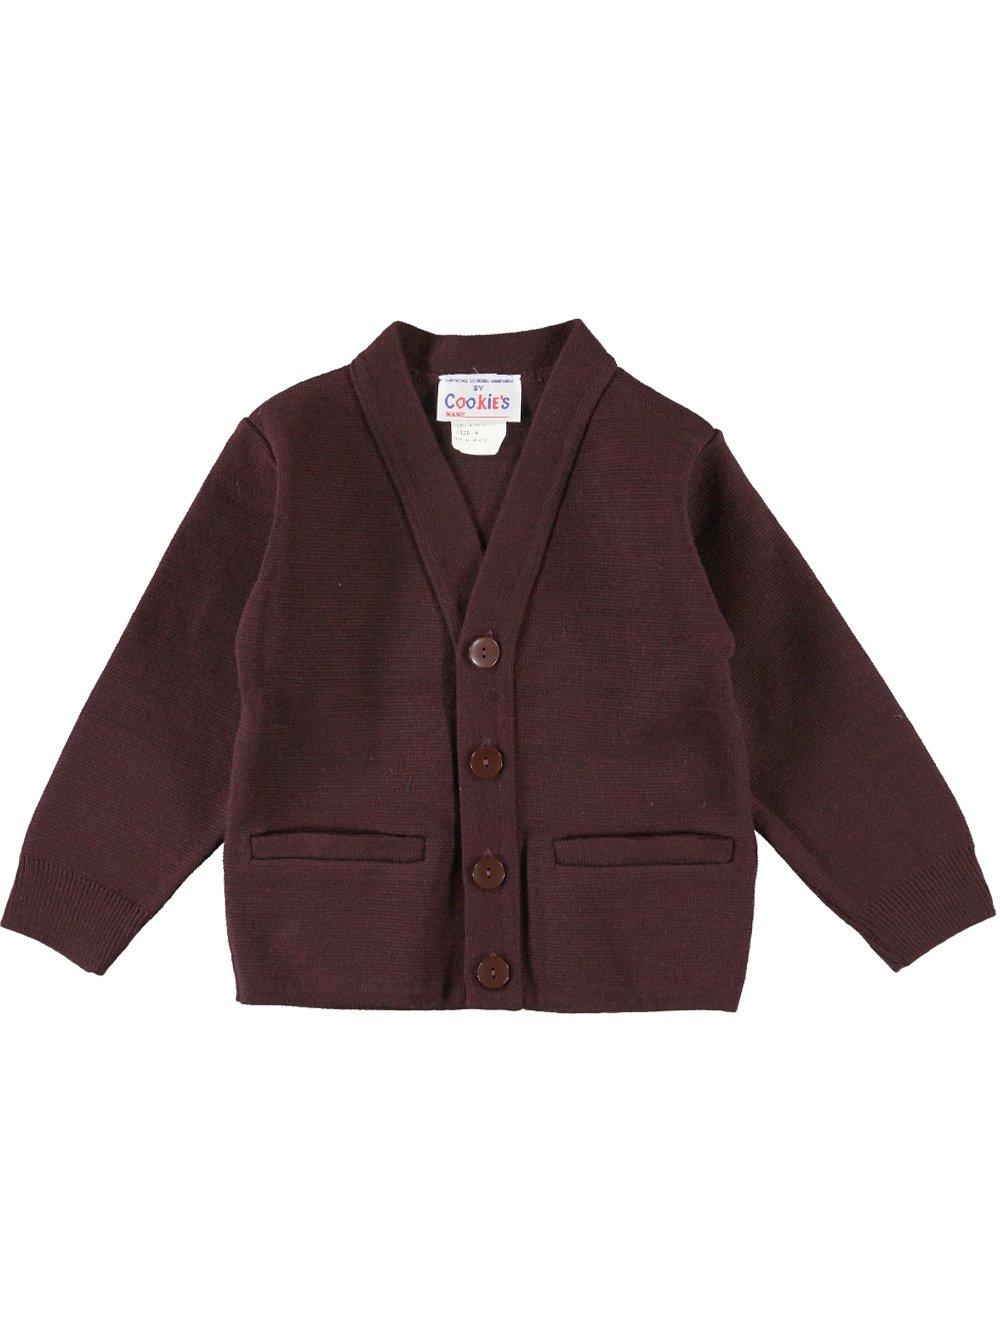 Cookie's Brand Big Boys' Cardigan Sweater - burgundy, 12